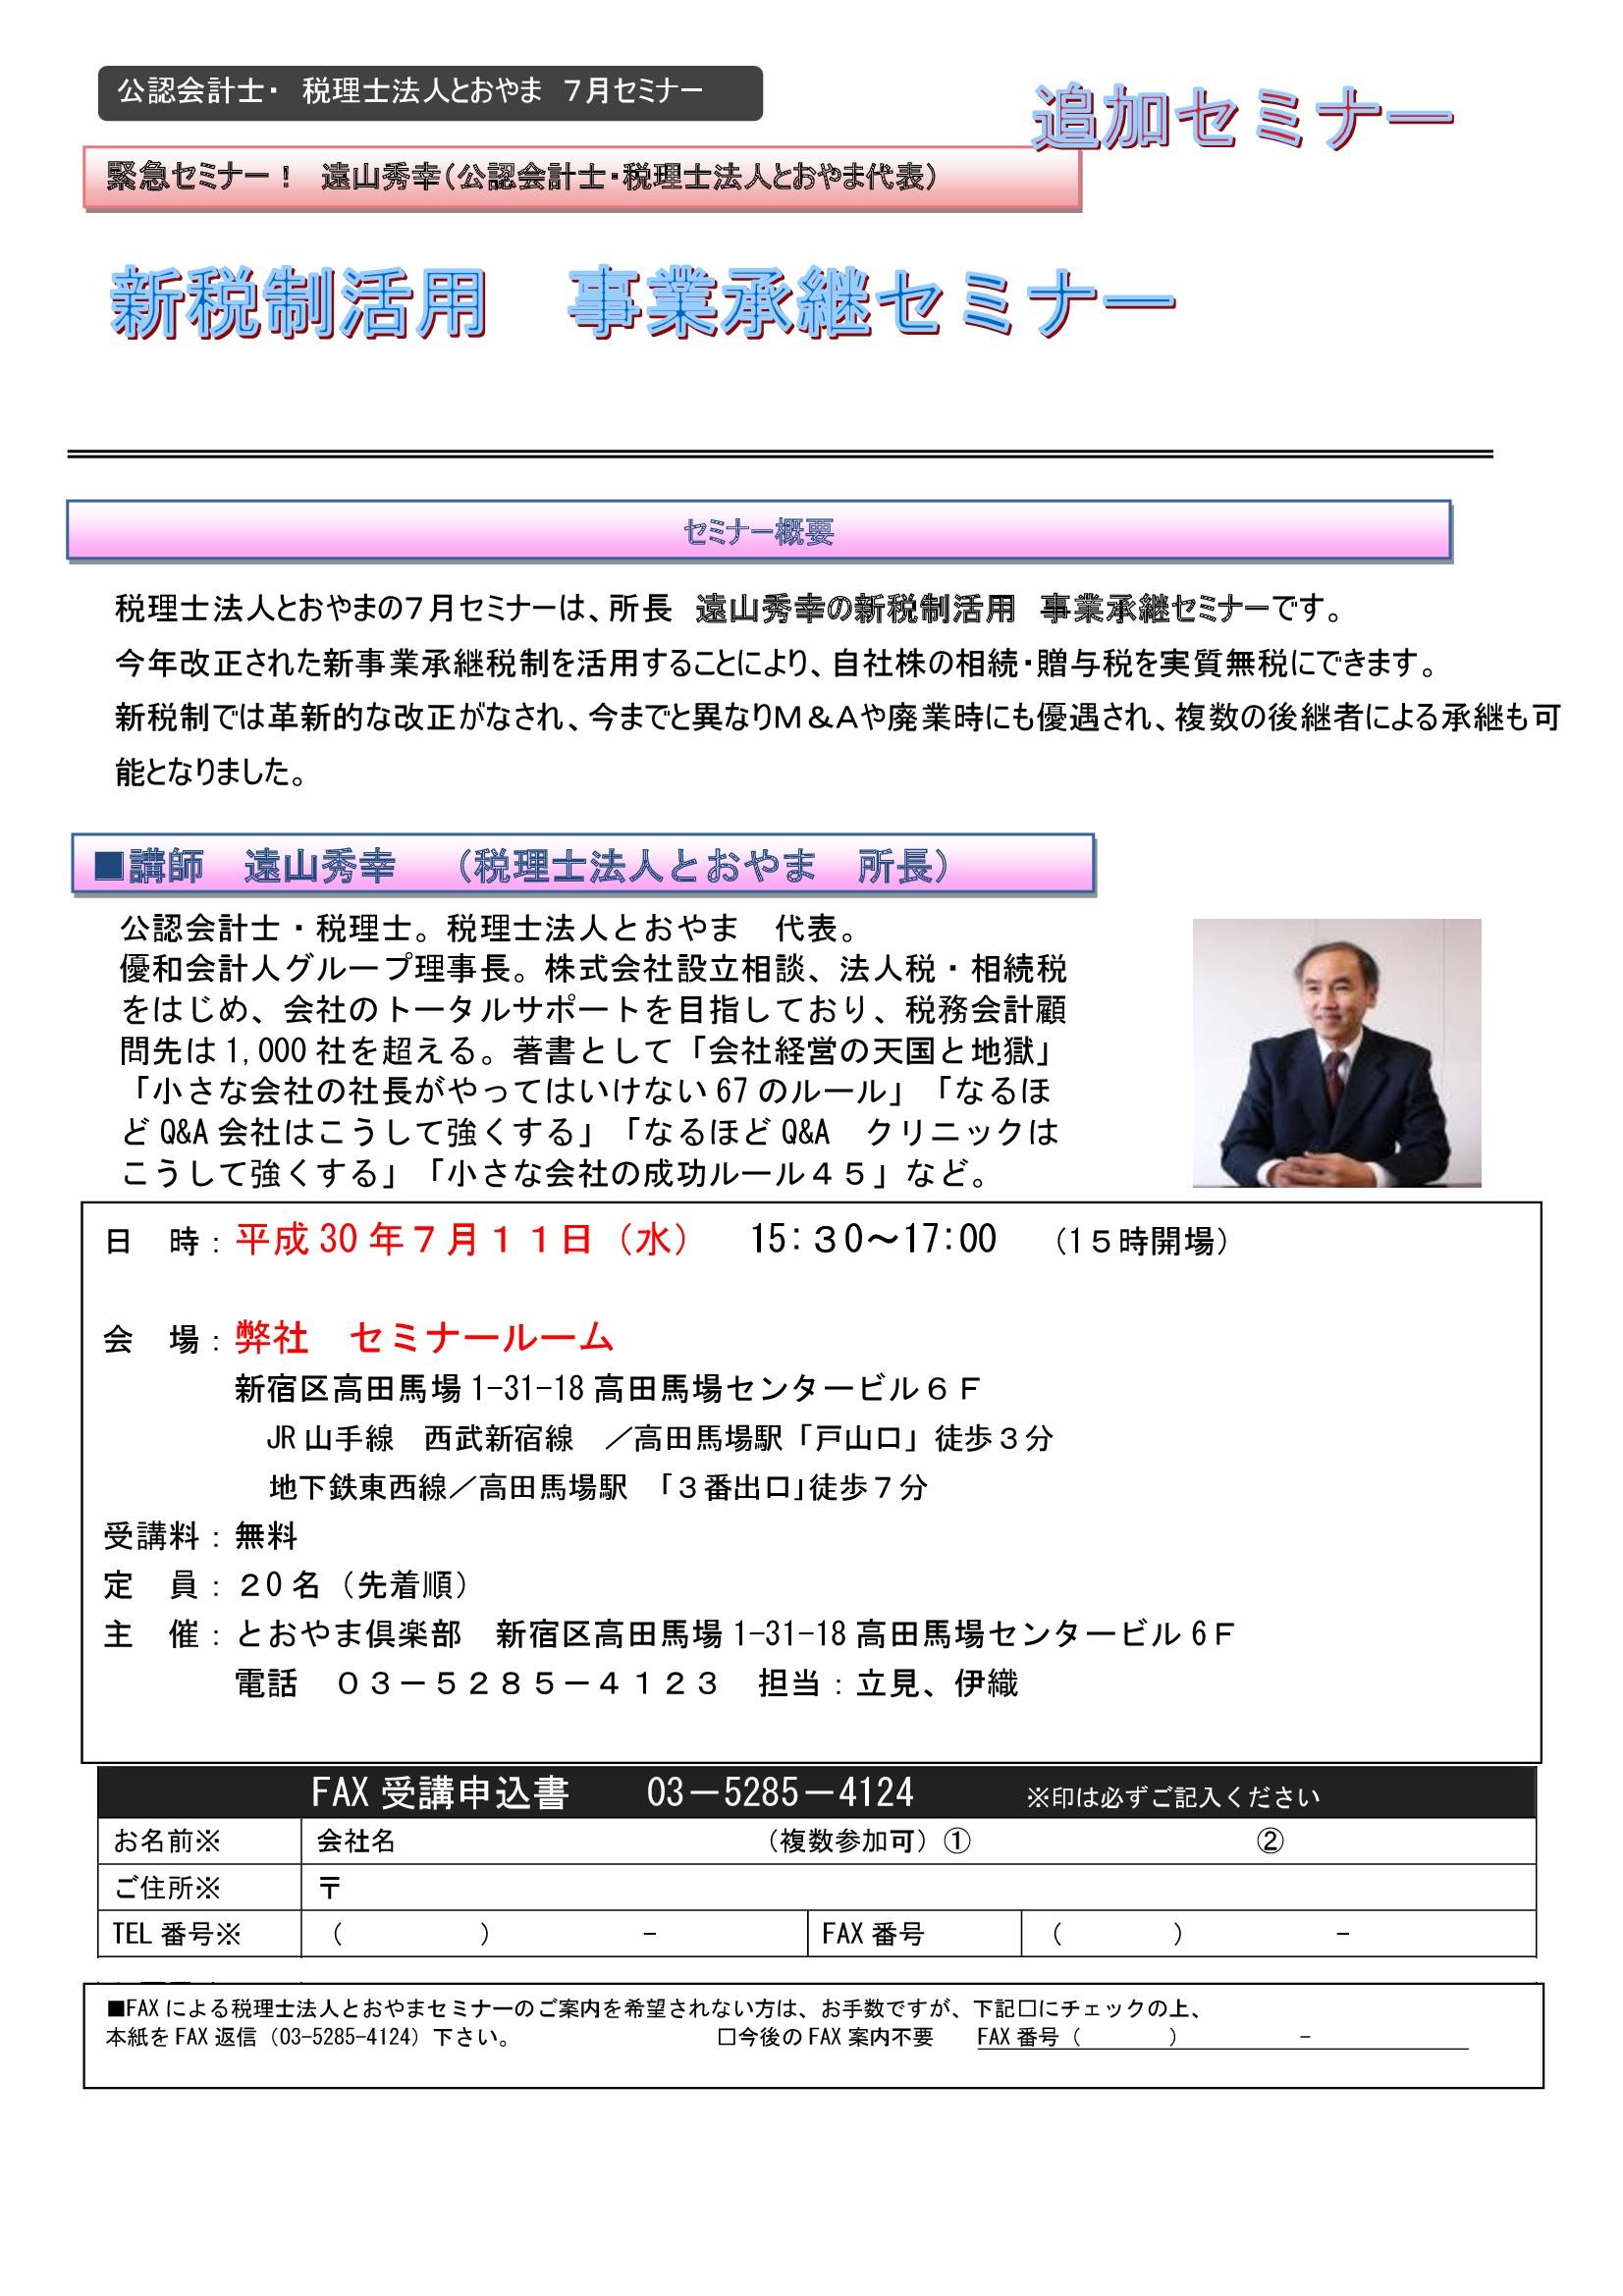 追加セミナー決定! 7月11日開催 新税制活用 事業承継セミナー